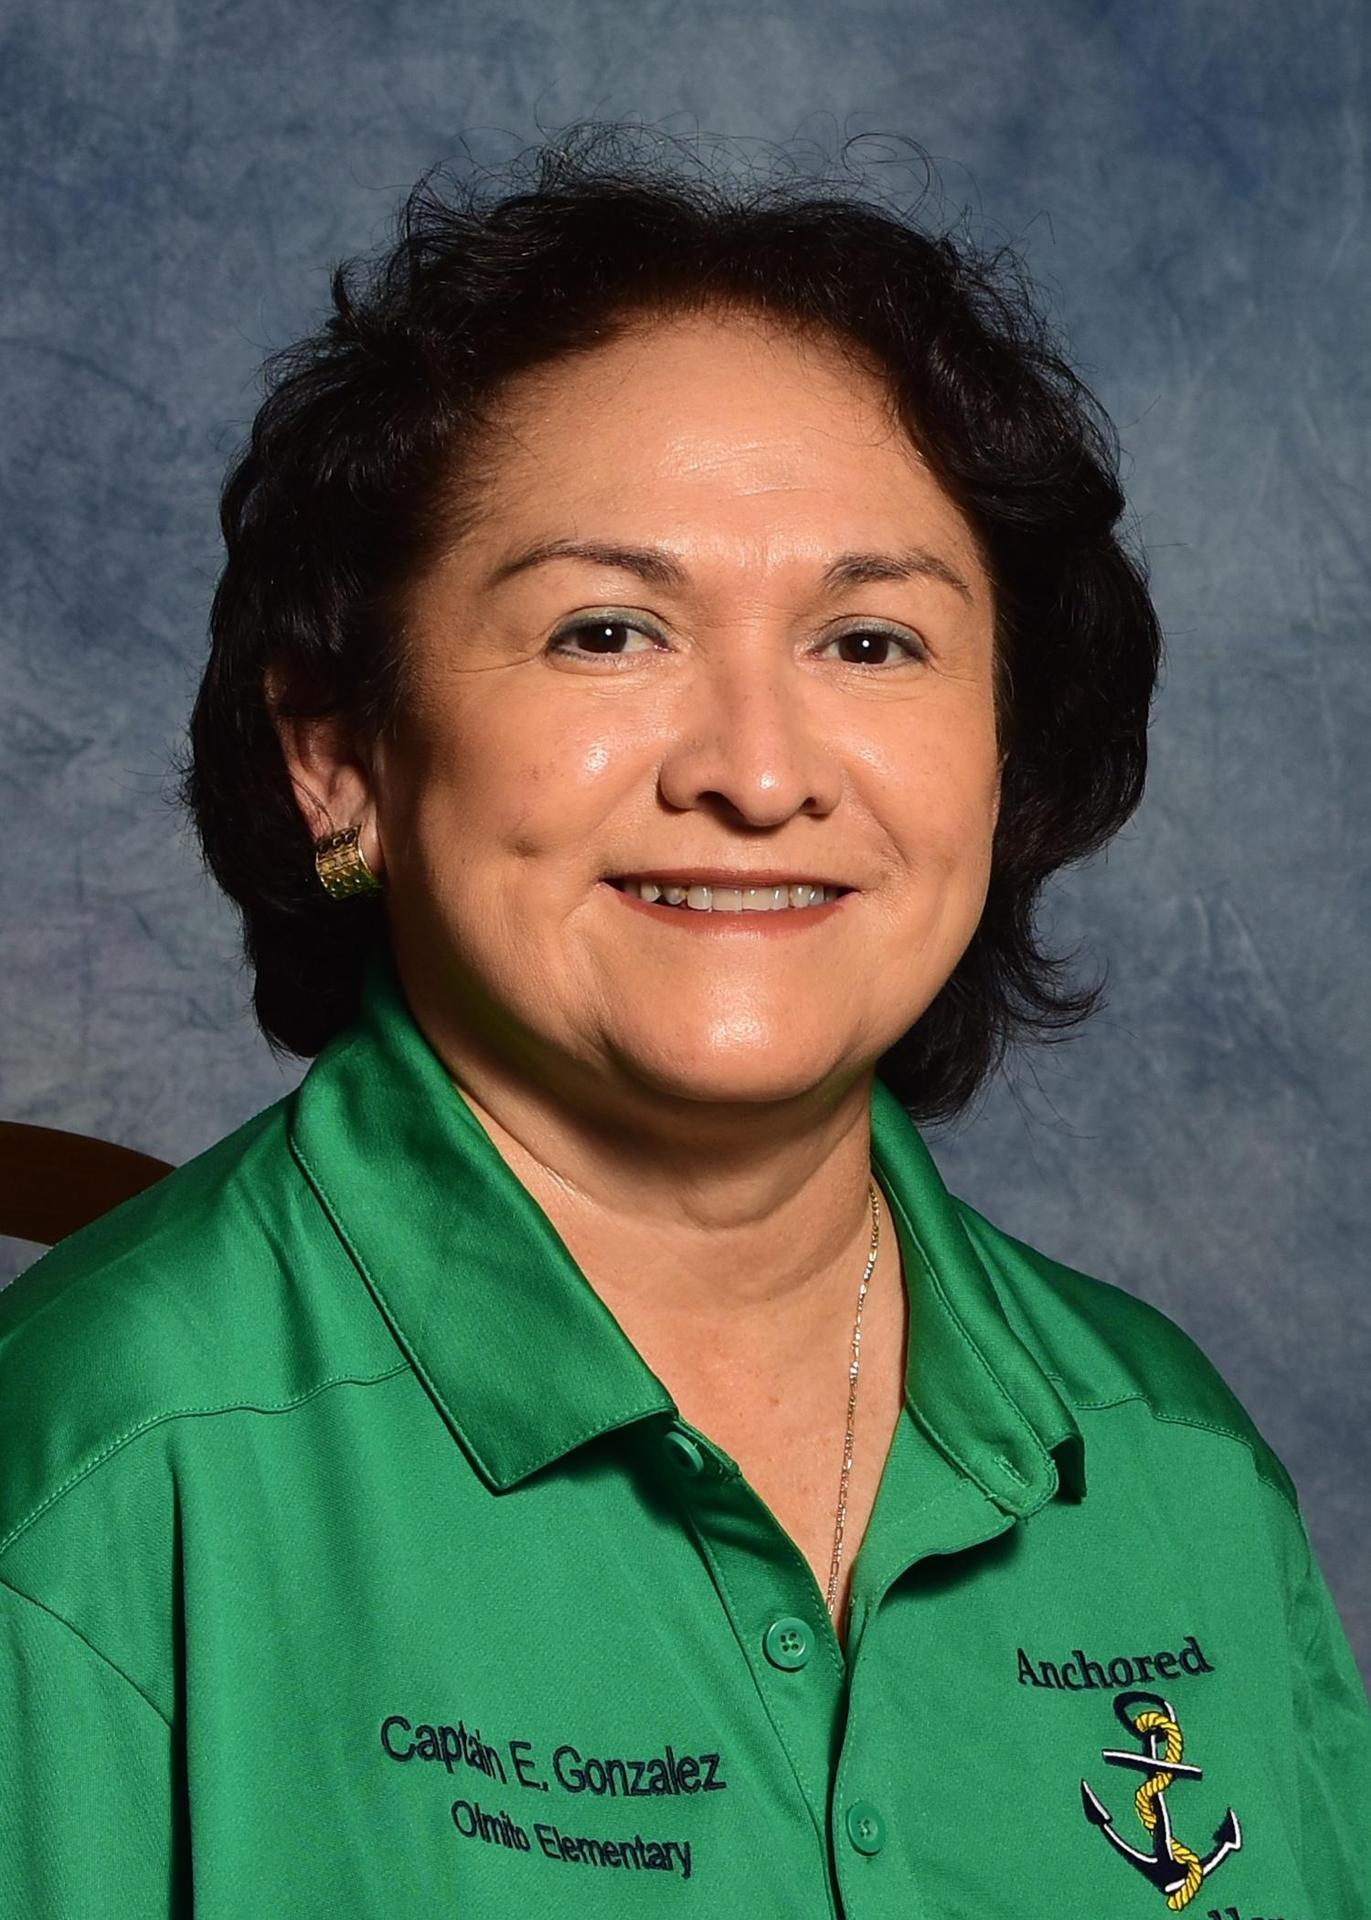 E. Gonzalez